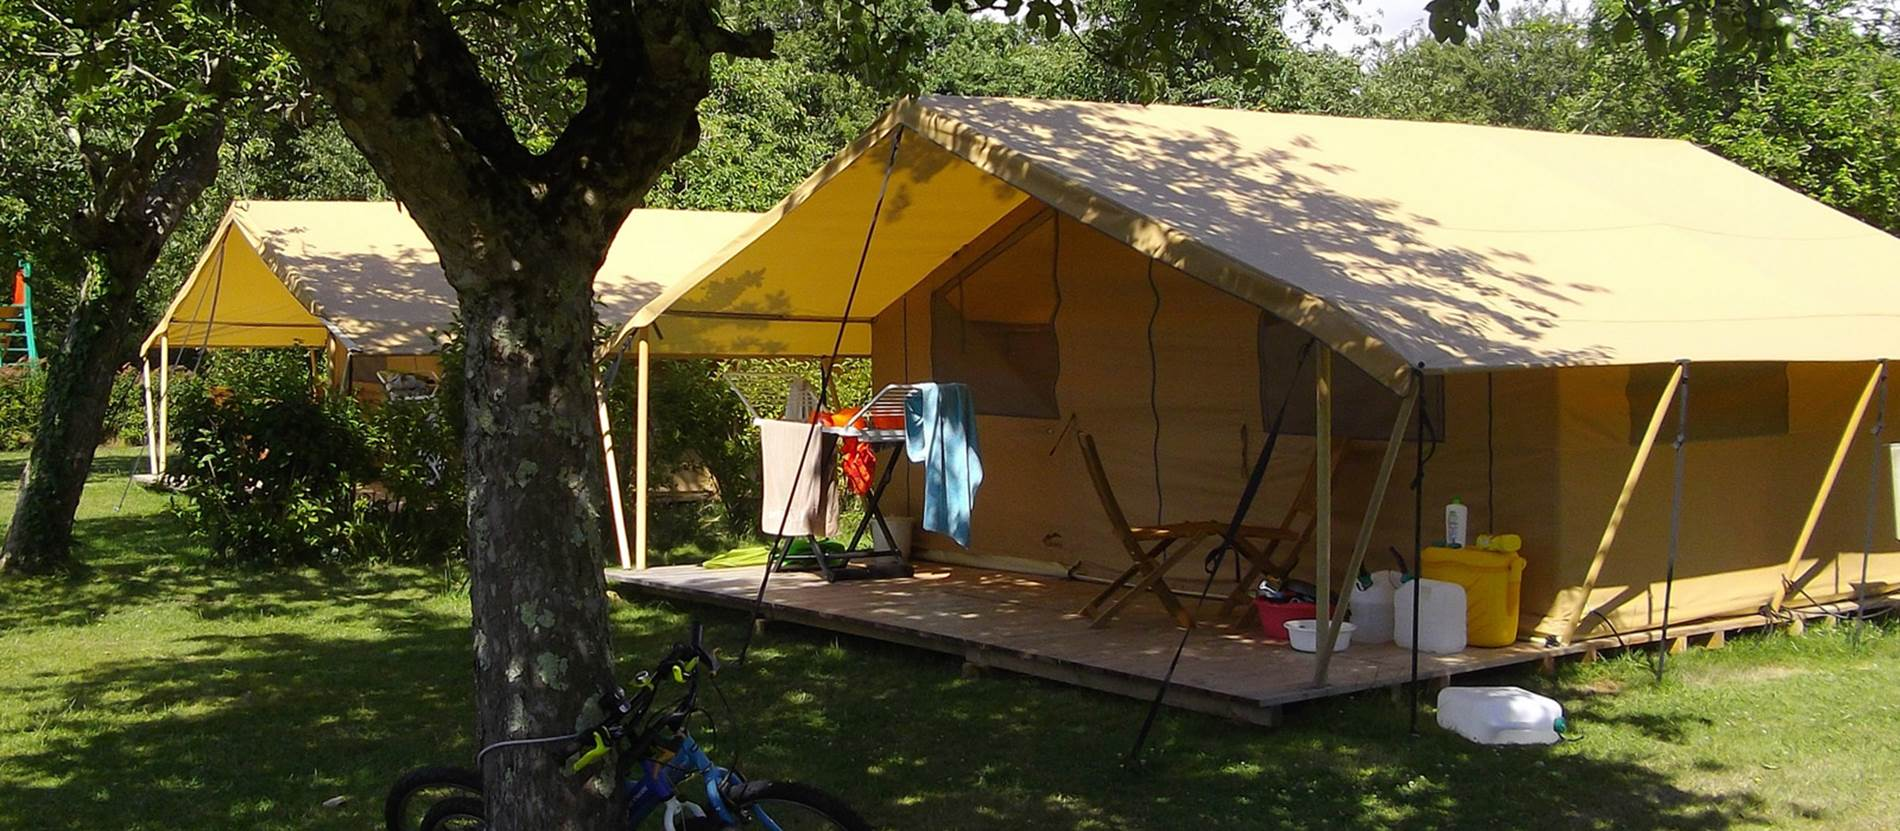 Camping-de-l-Allee-Arradon-Morbihan-Bretagne-Sud © Camping-de-l-Allee-Arradon